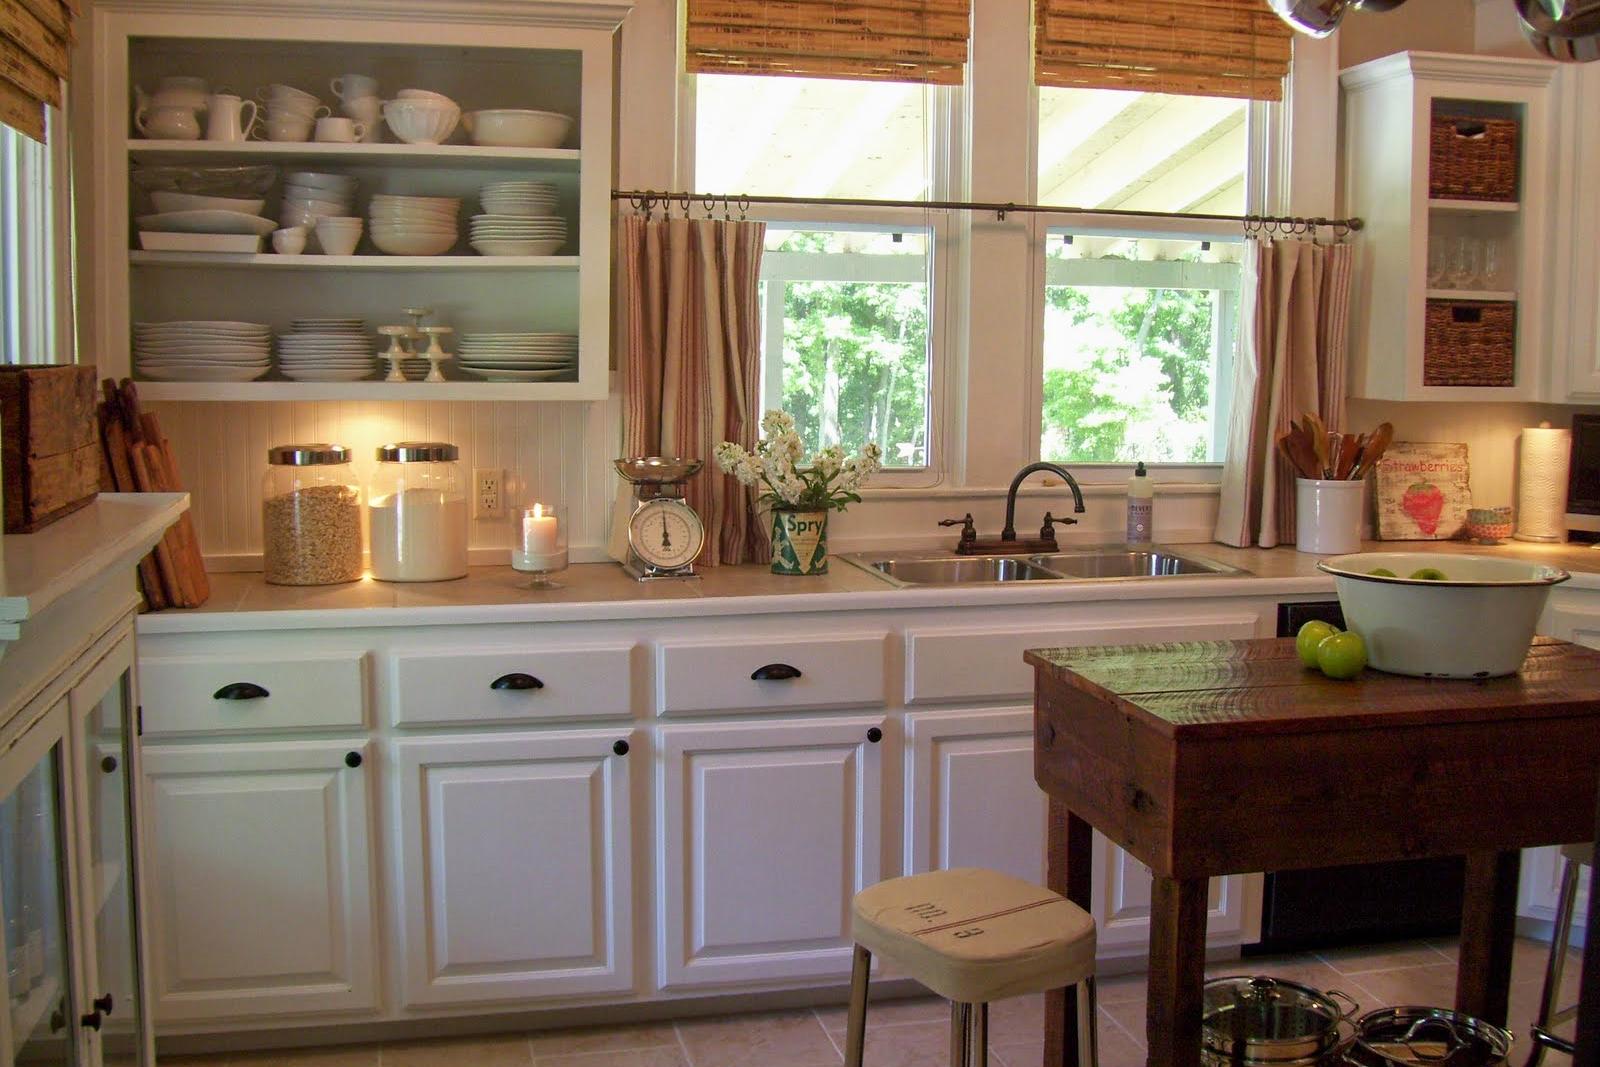 diy kitchen remodel   budget kitchen remodel